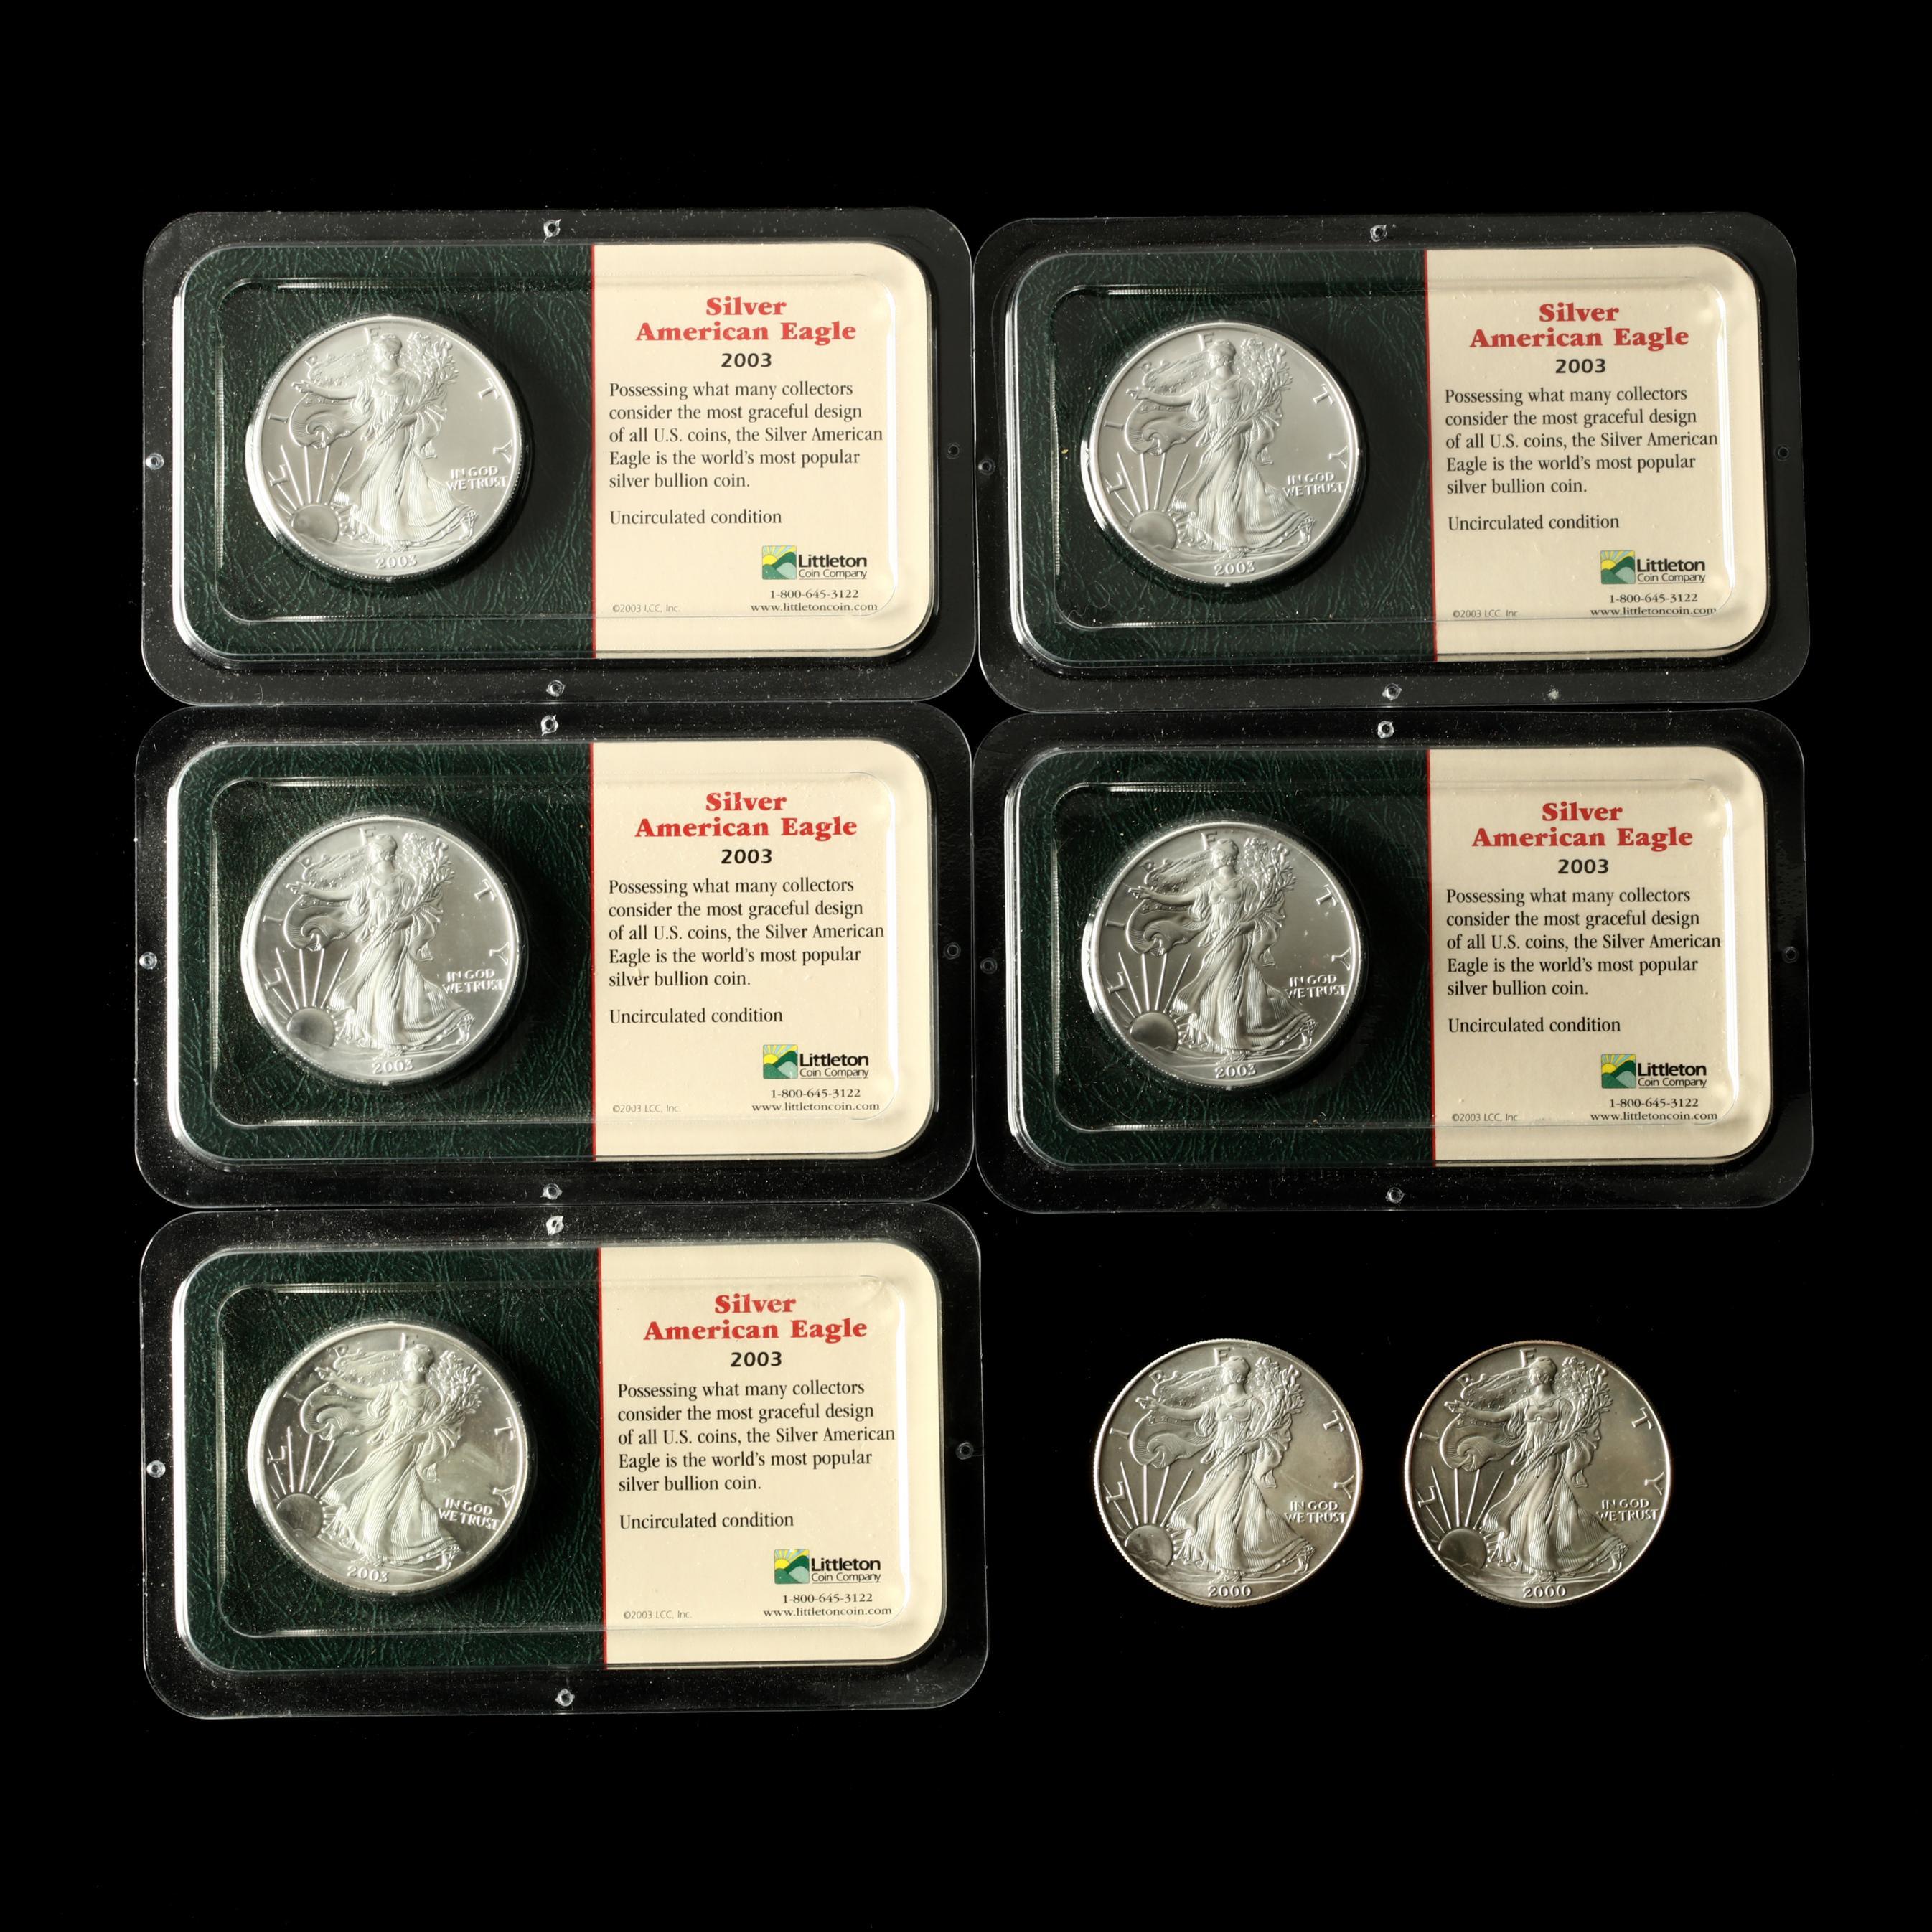 seven-bu-1-american-silver-eagle-one-ounce-bullion-coins